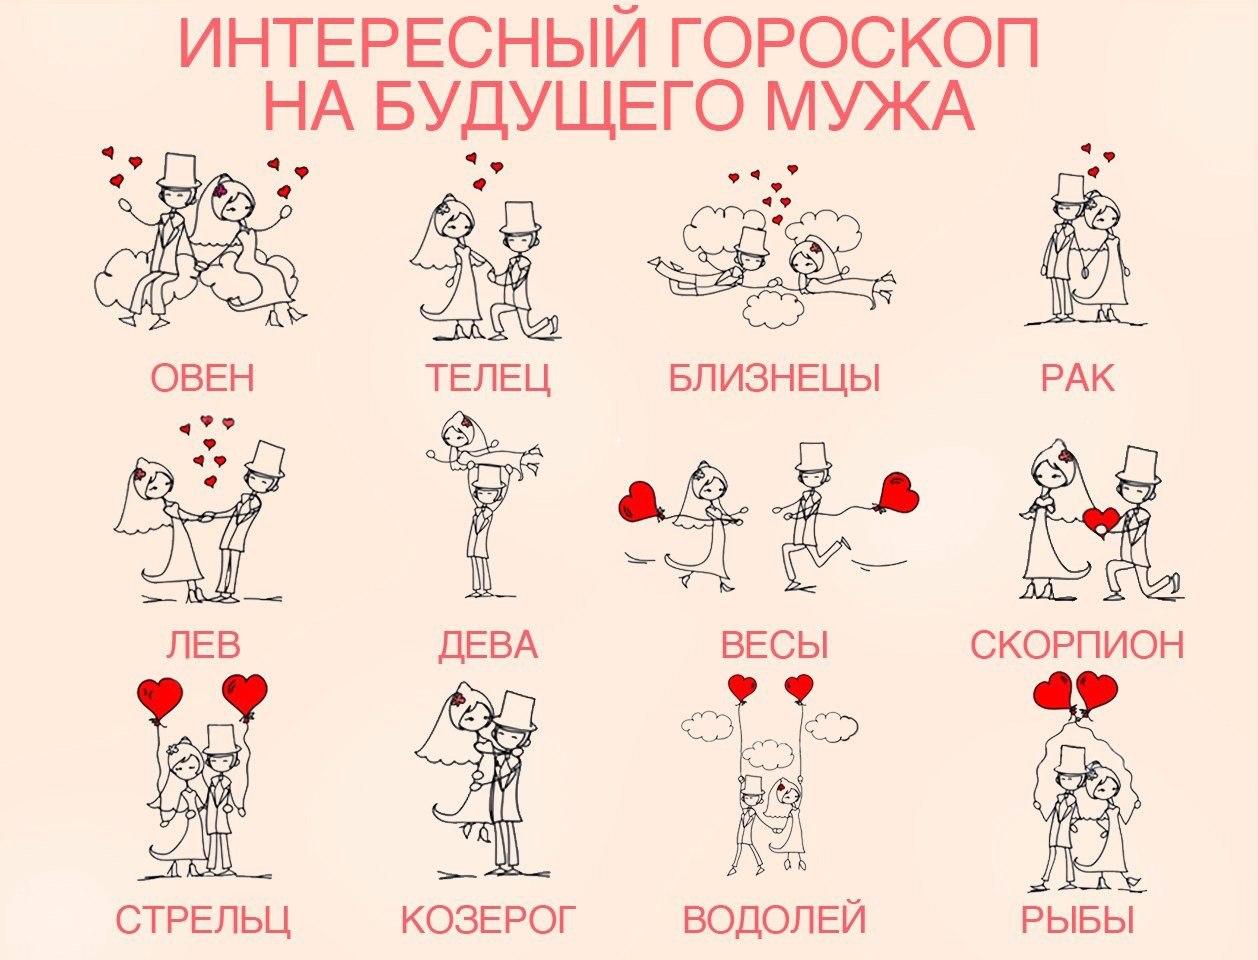 foto-korolev-transvestitov-blogs